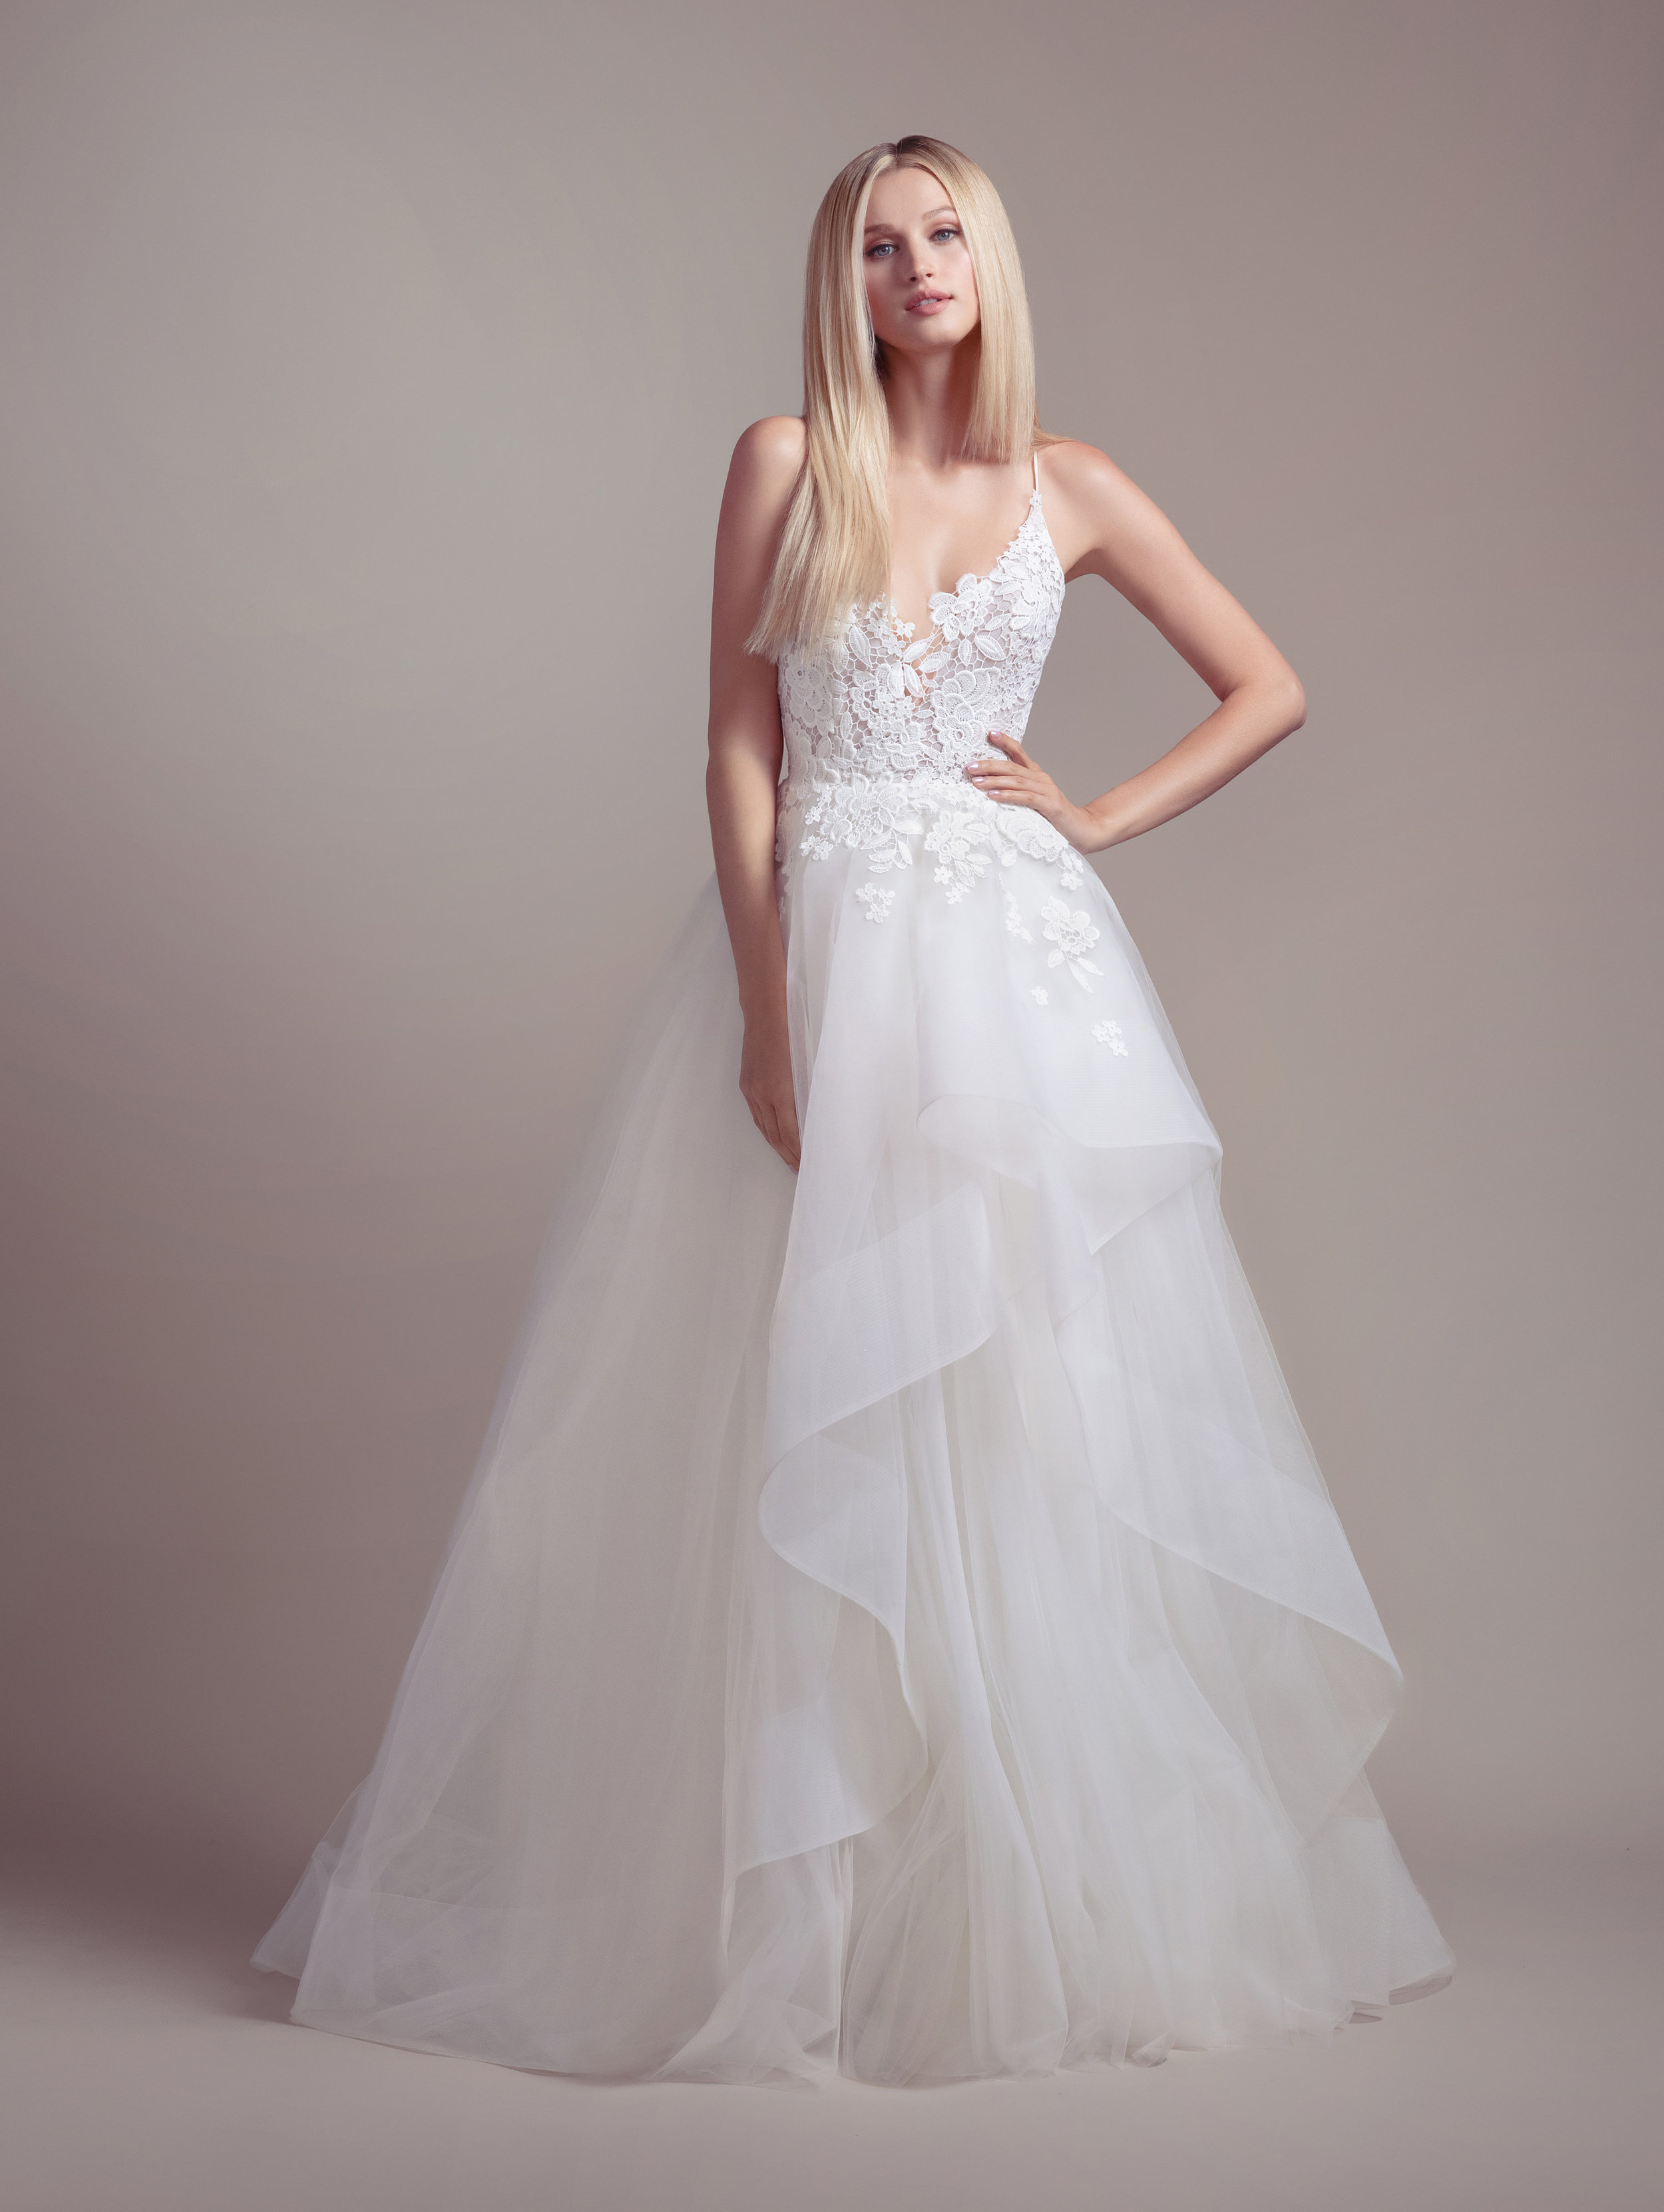 blush-hayley-paige-bridal-spring-2019-style-1900-clover_0.jpg